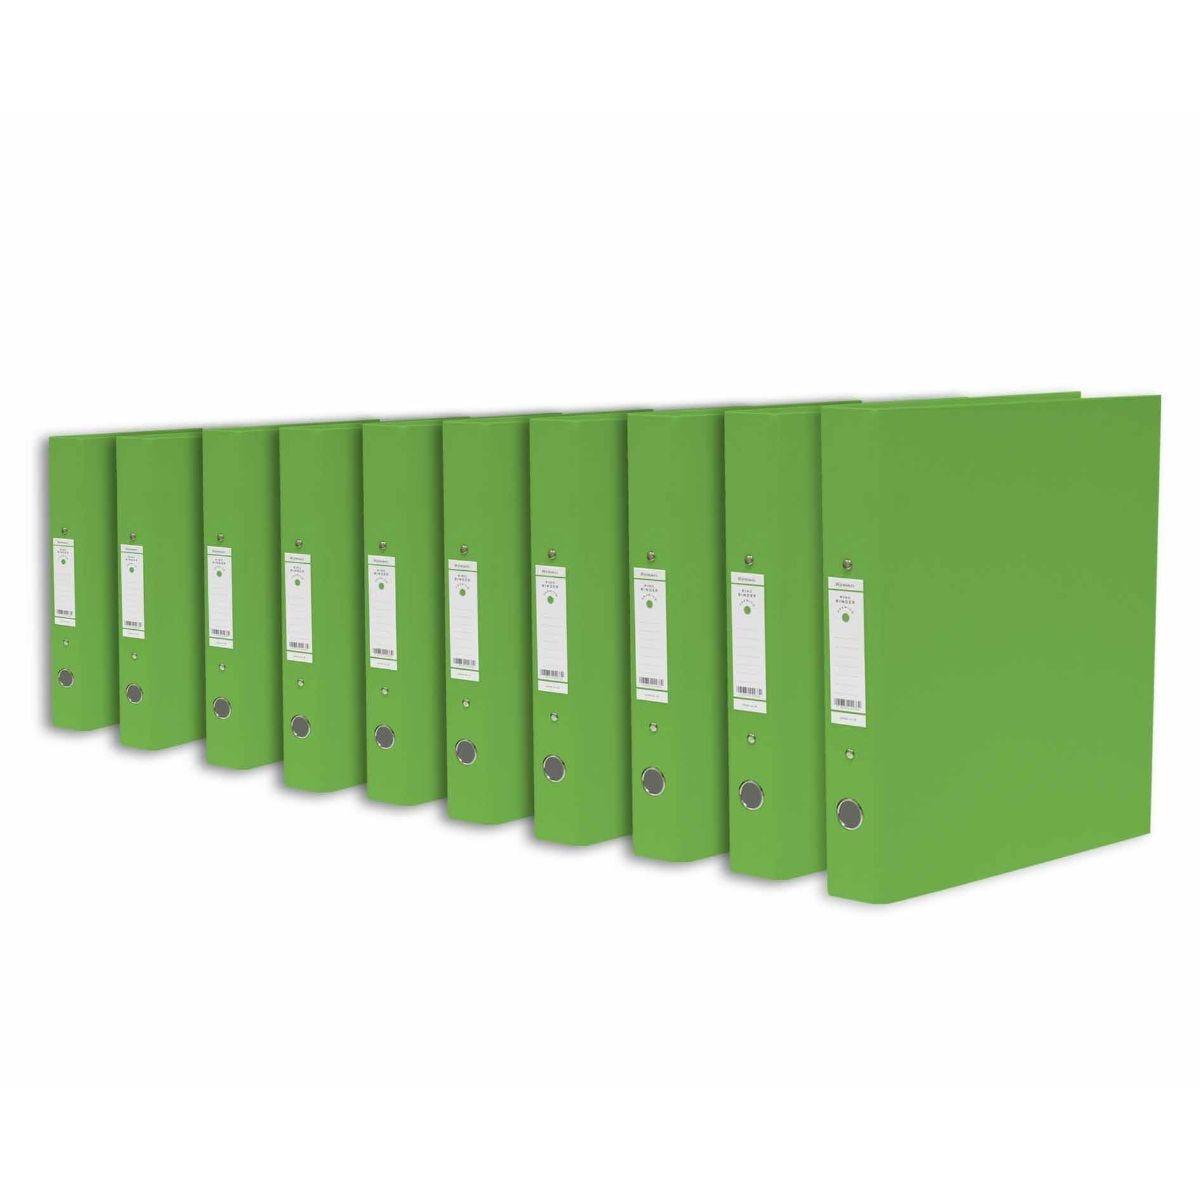 Ryman Premium Ring Binder Pack of 10 Lime